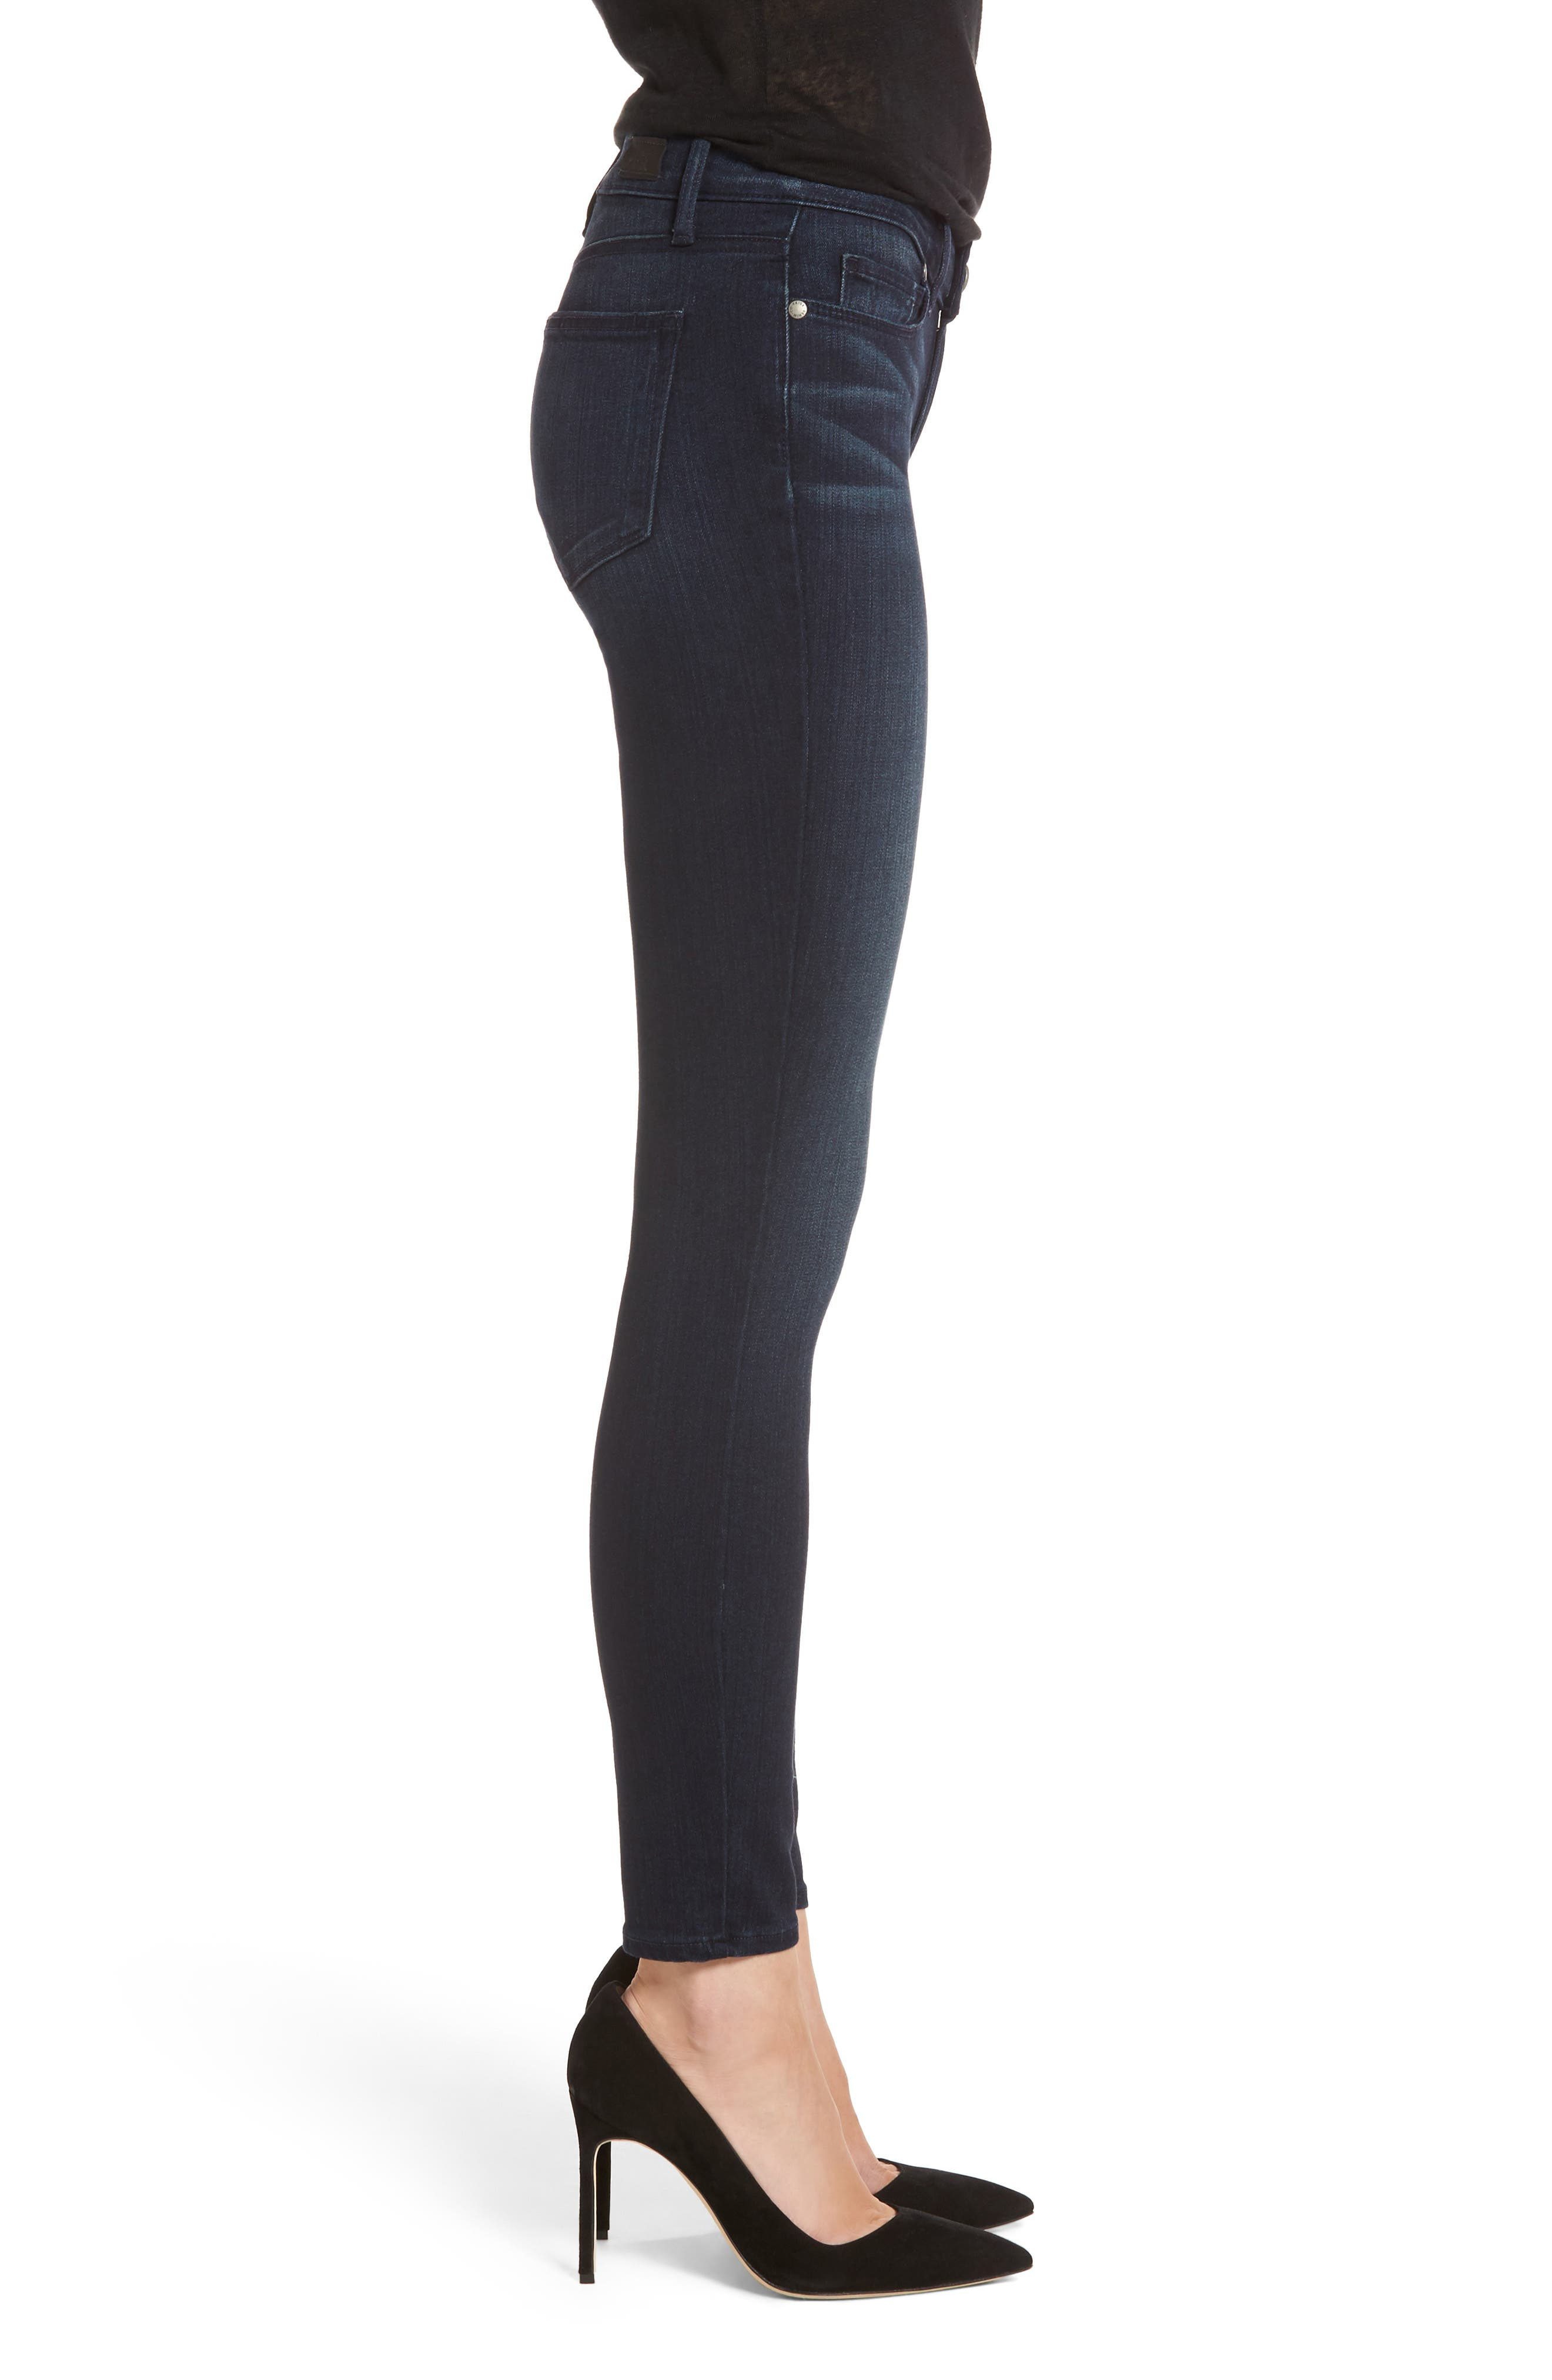 Transcend - Verdugo Ankle Skinny Jeans,                             Alternate thumbnail 3, color,                             Midlake